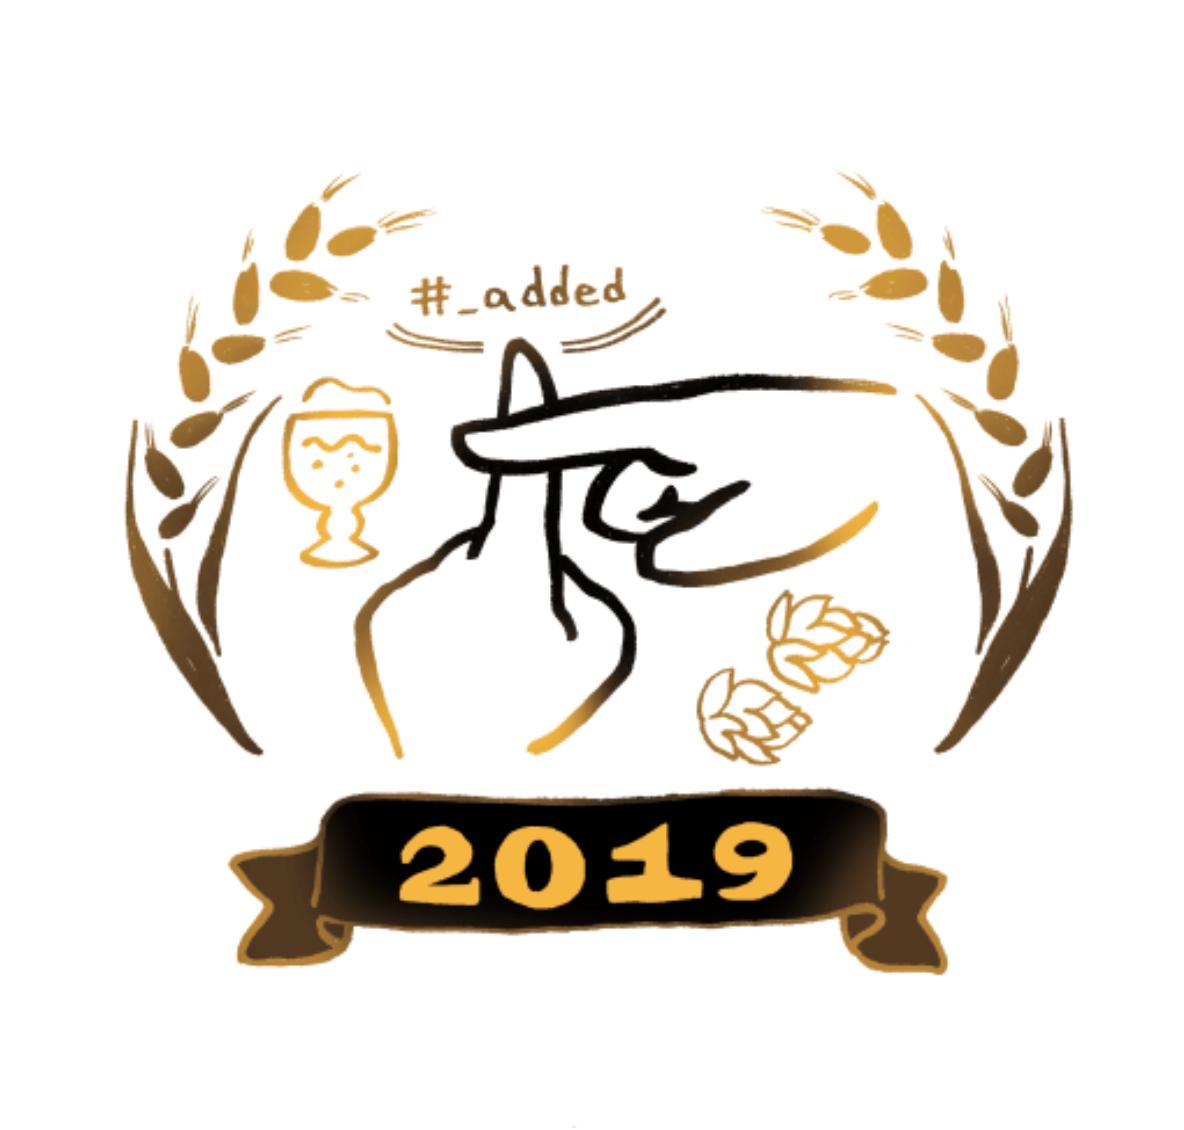 Tsukuba Craft Beer Festival 2019・つくばクラフトビールフェスタ2019